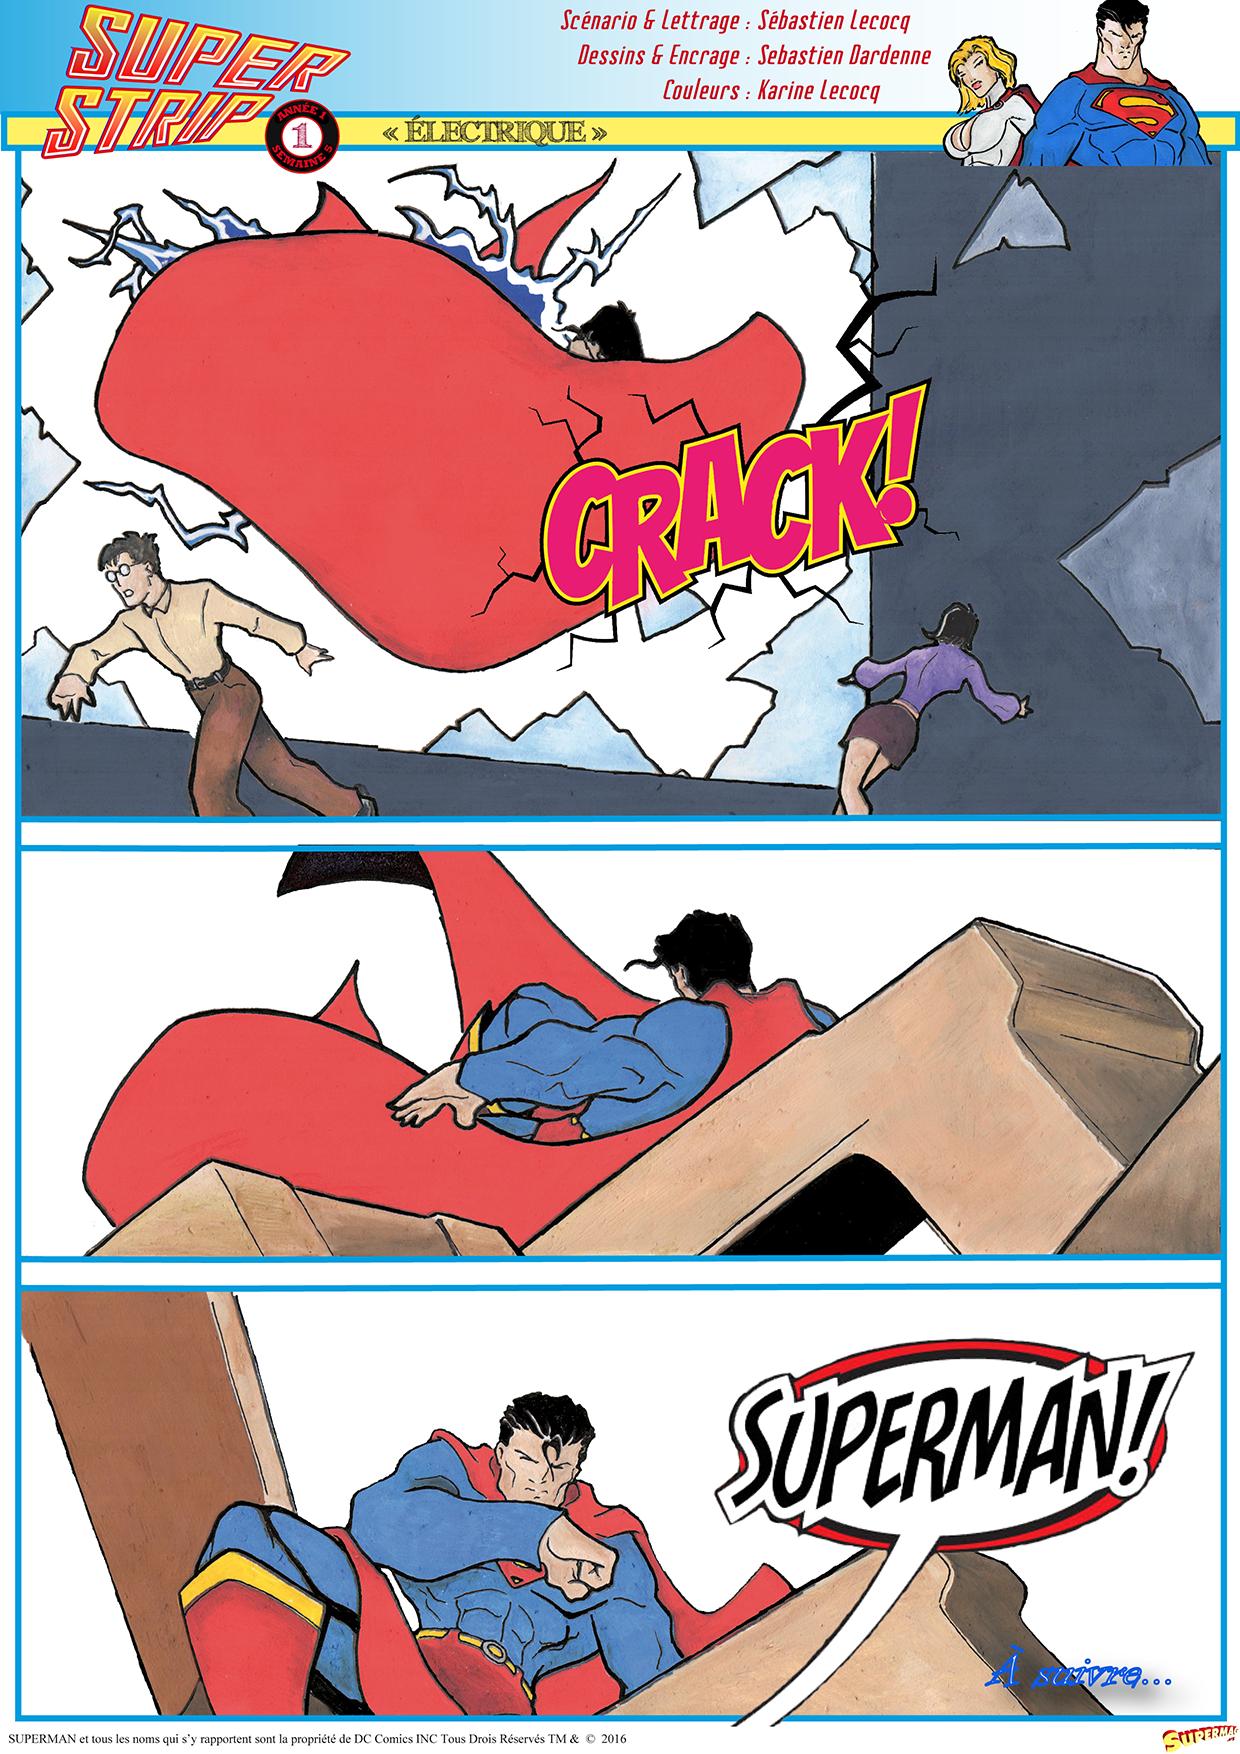 Superstrip